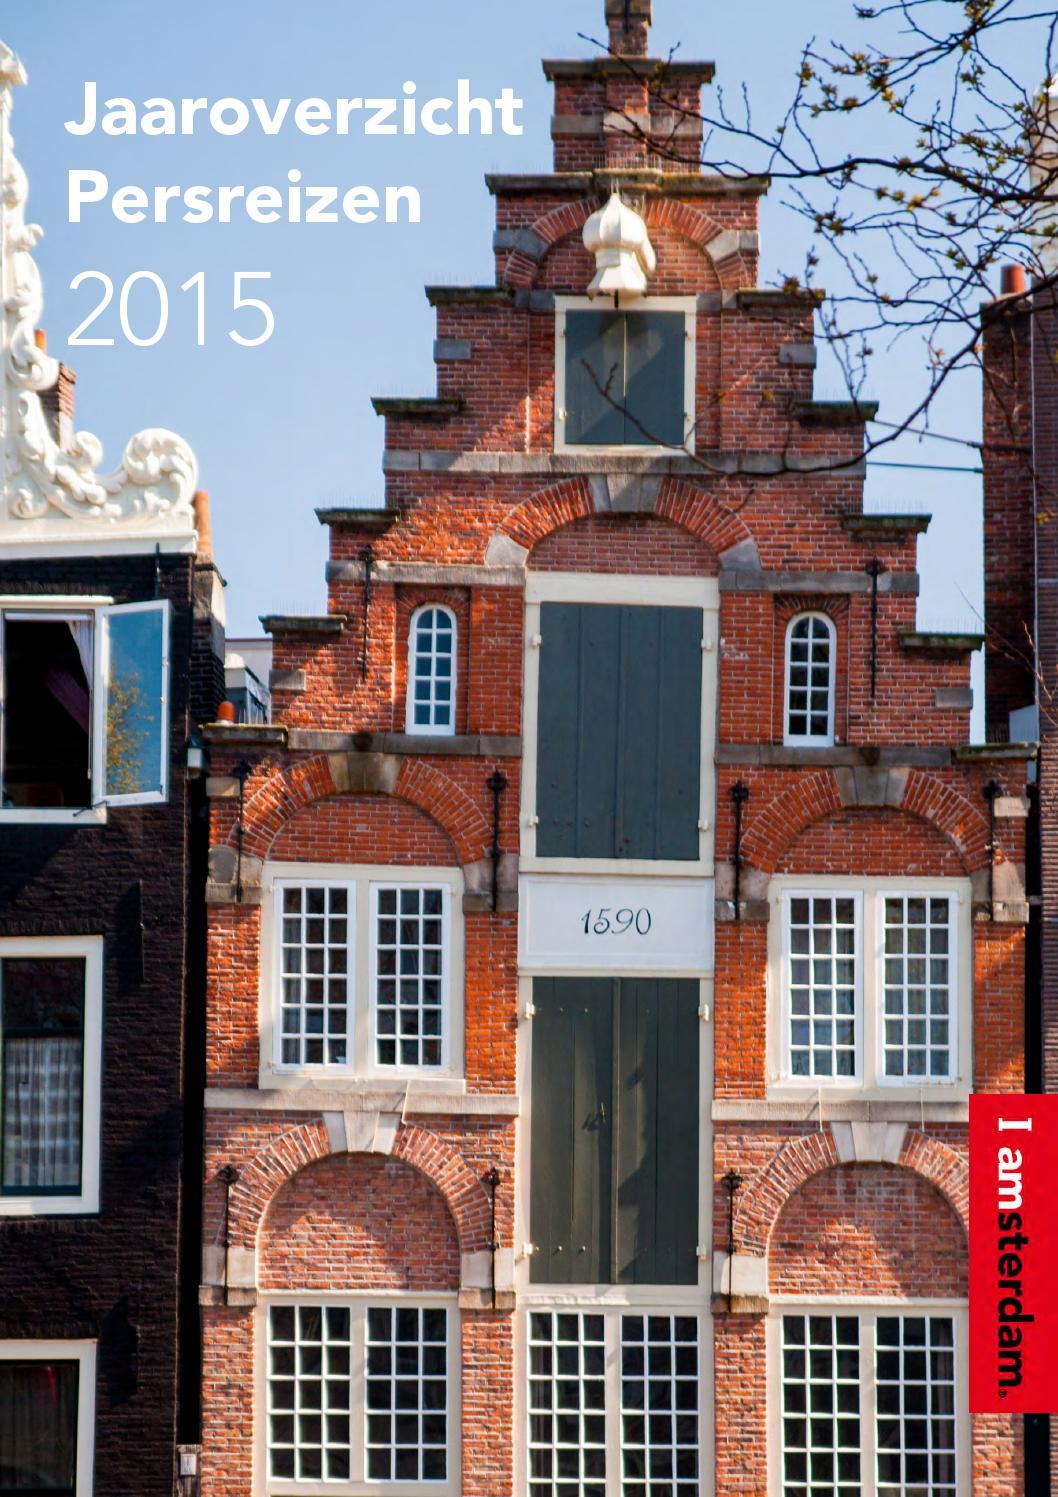 Jardin Zoologique Lisbonne Frais Jaaroverzicht Persreizen 2015 Amsterdam Marketing by